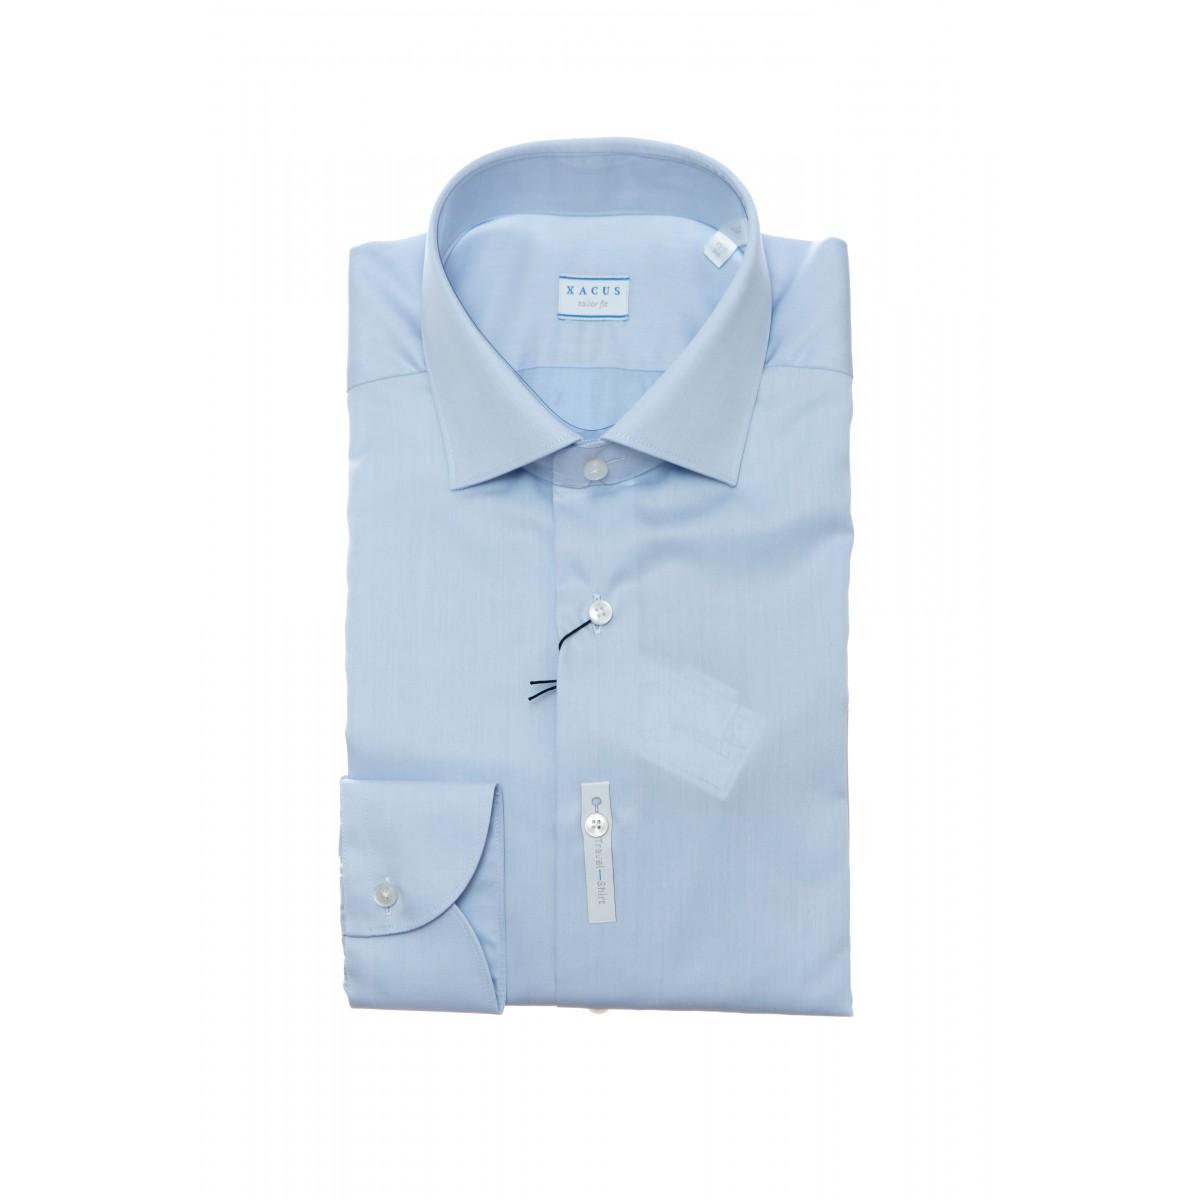 Camicia uomo - 11363 558  tessuto no stiro tailor